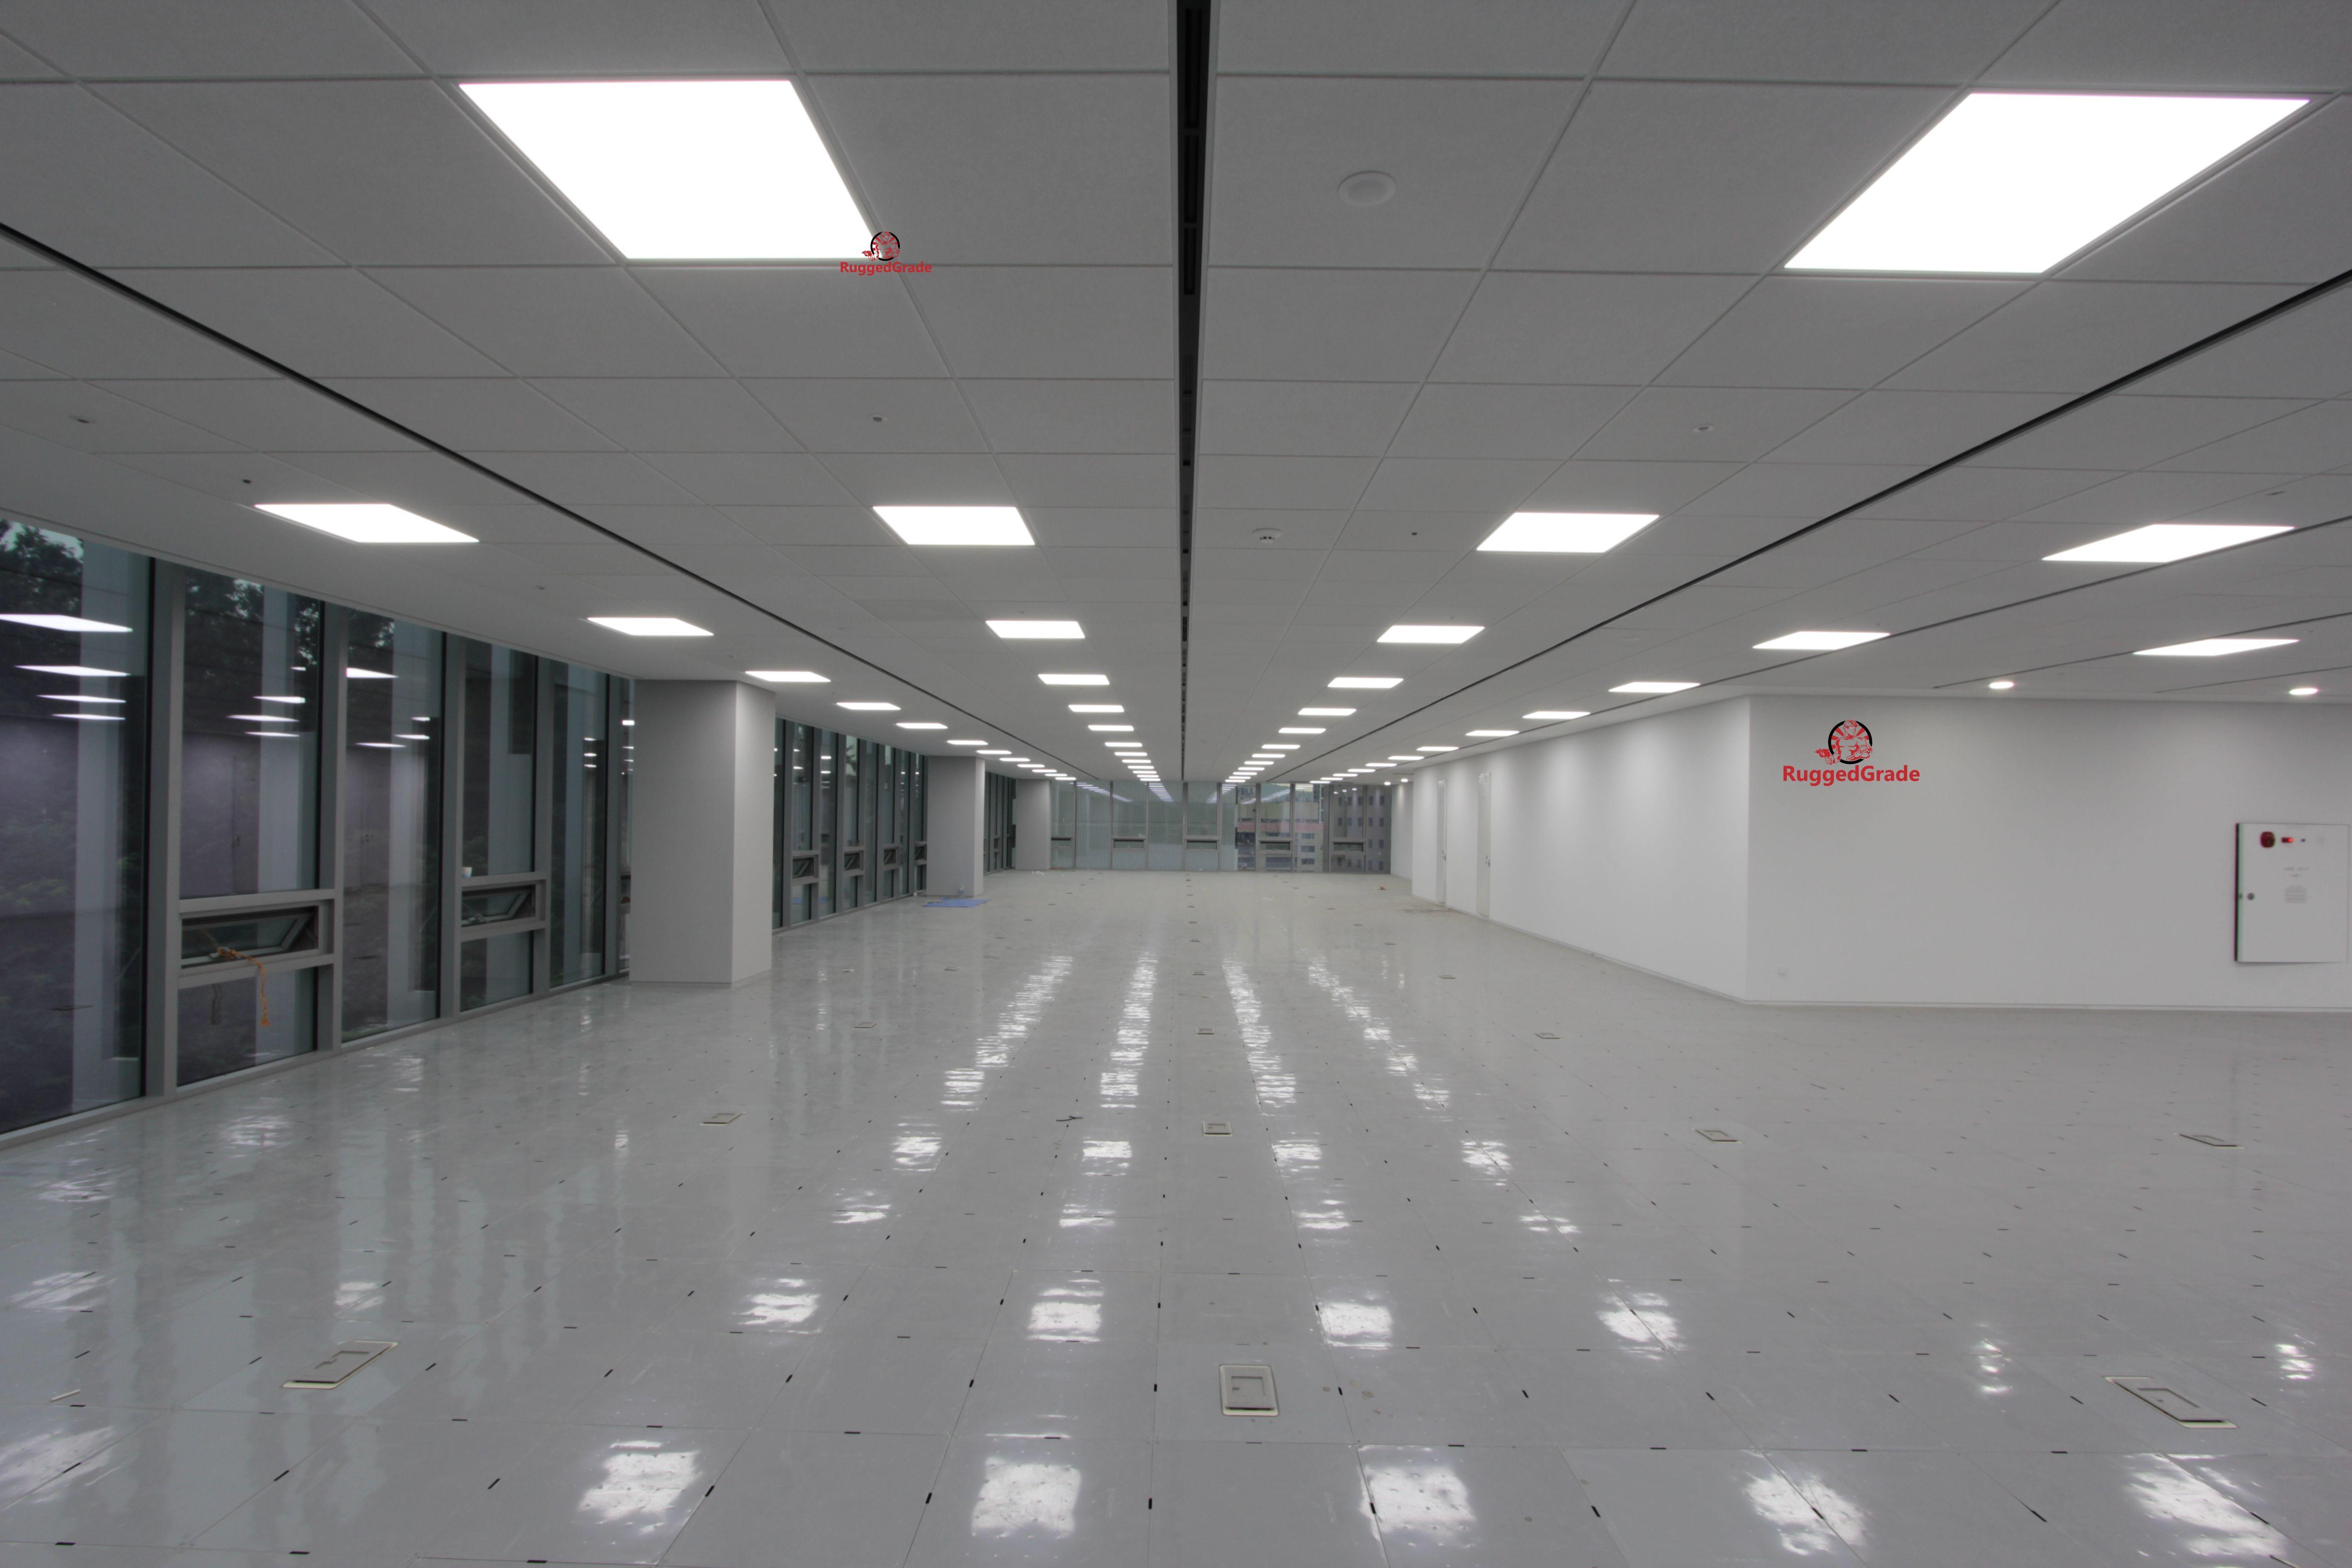 2x4 Feet - 50 Watt Panel Light- Troffer Light - 5000K